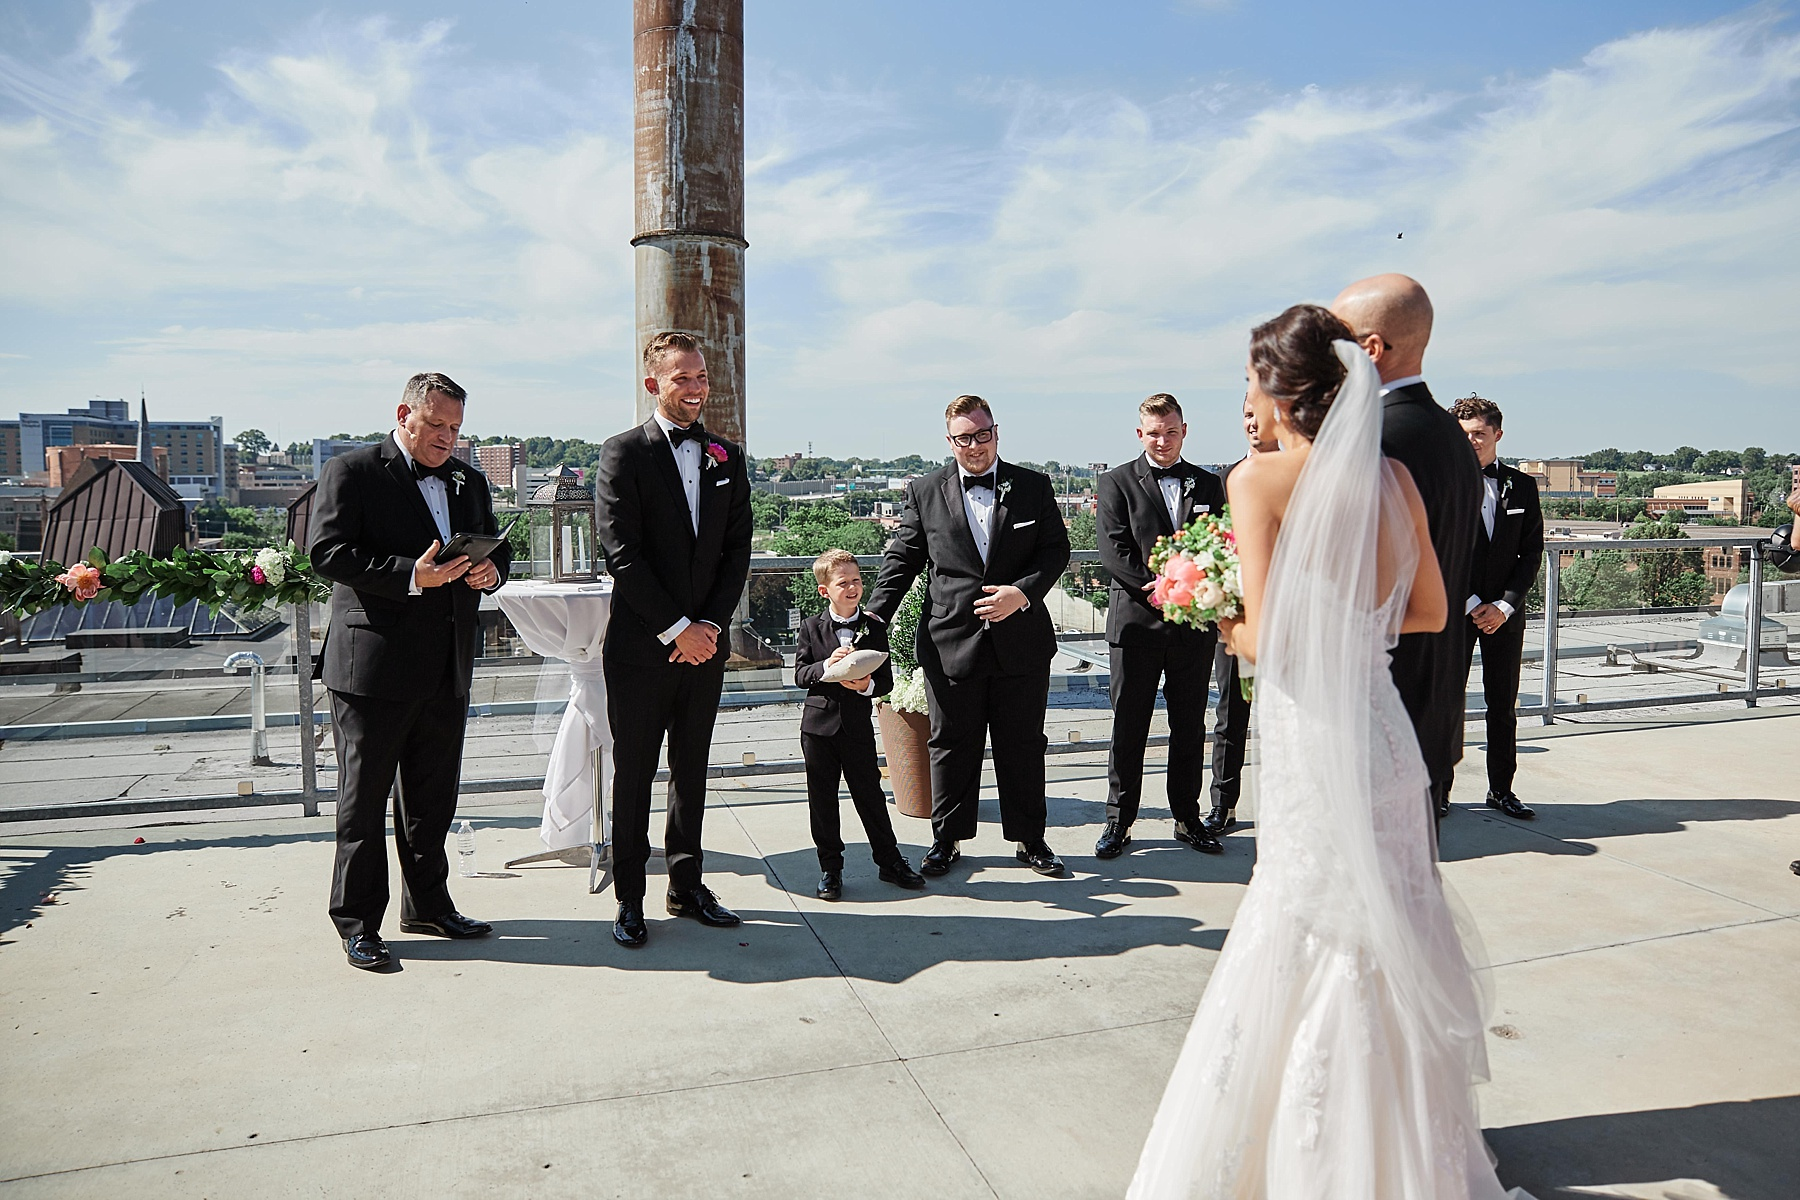 ABULAE-Wedding-Saint-paul-MN-Josh-Sofia-Wedding-Mears-Park_0756.jpg